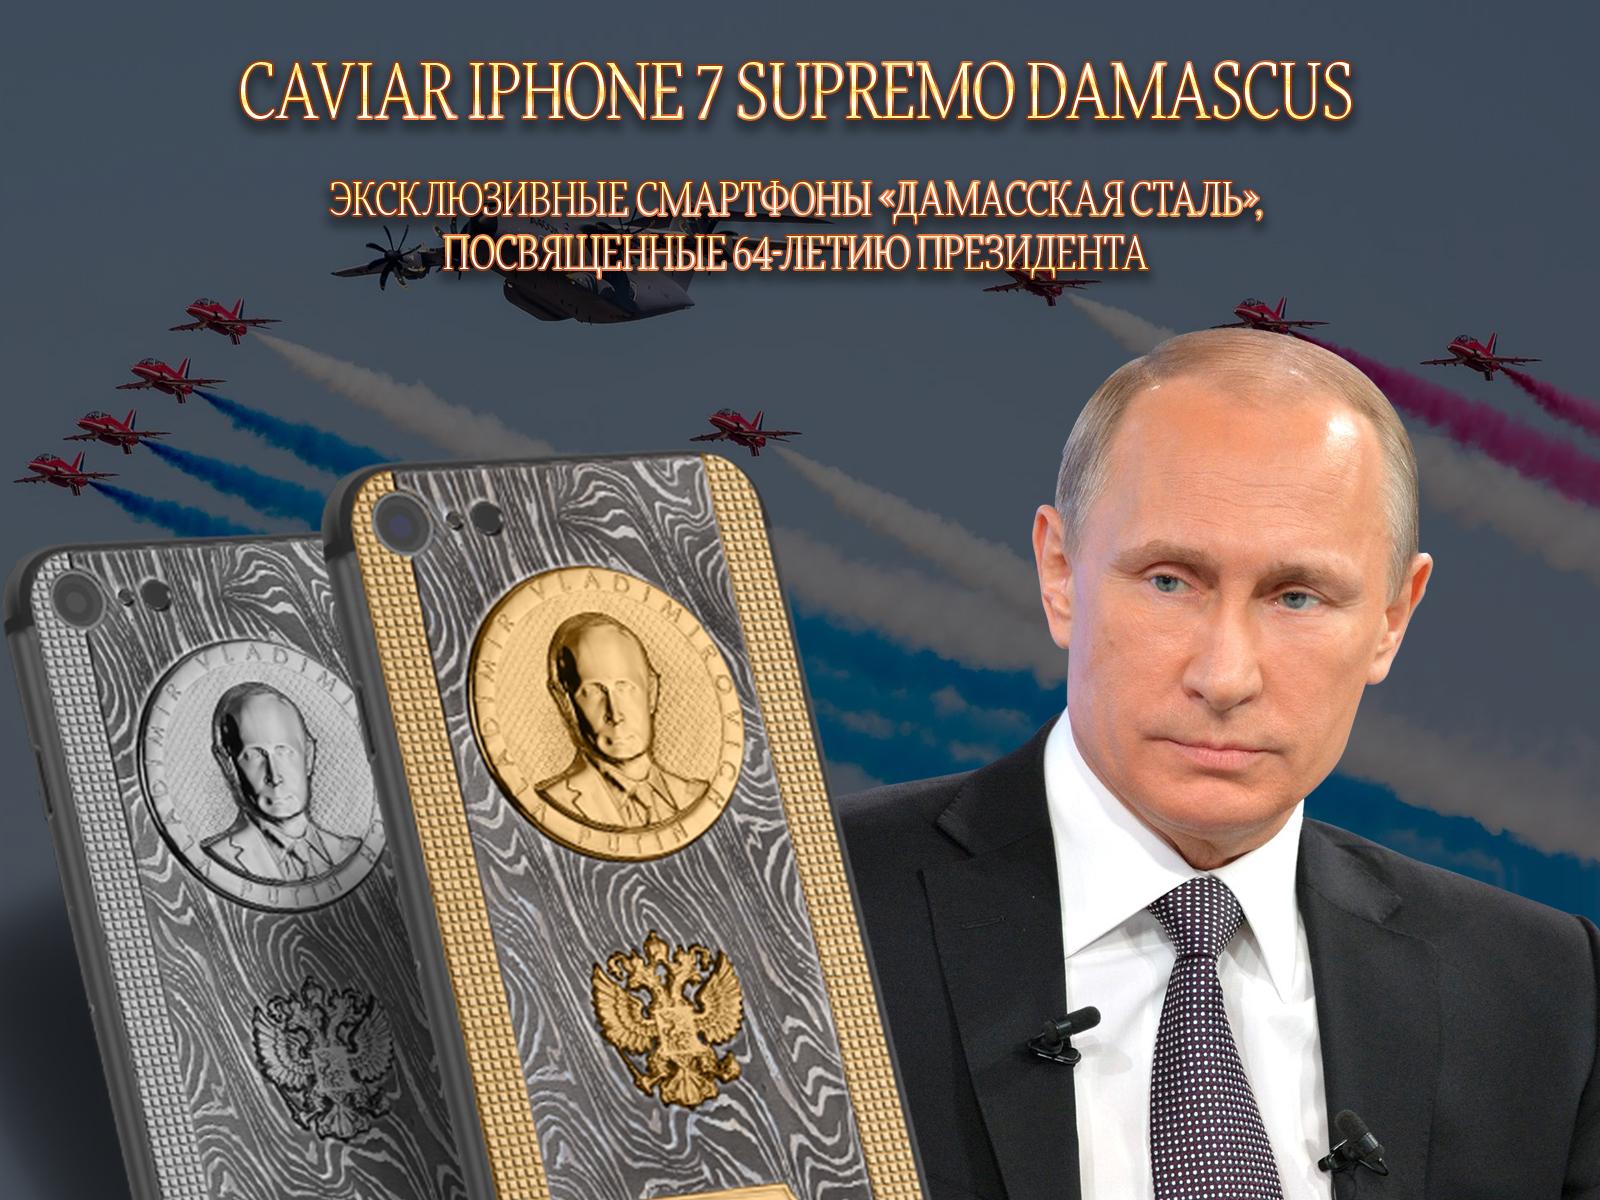 https://htstatic.imgsmail.ru/pic_image/7244ebb60296d27ed32cf778fbd18f6e/1920/-/1225765/